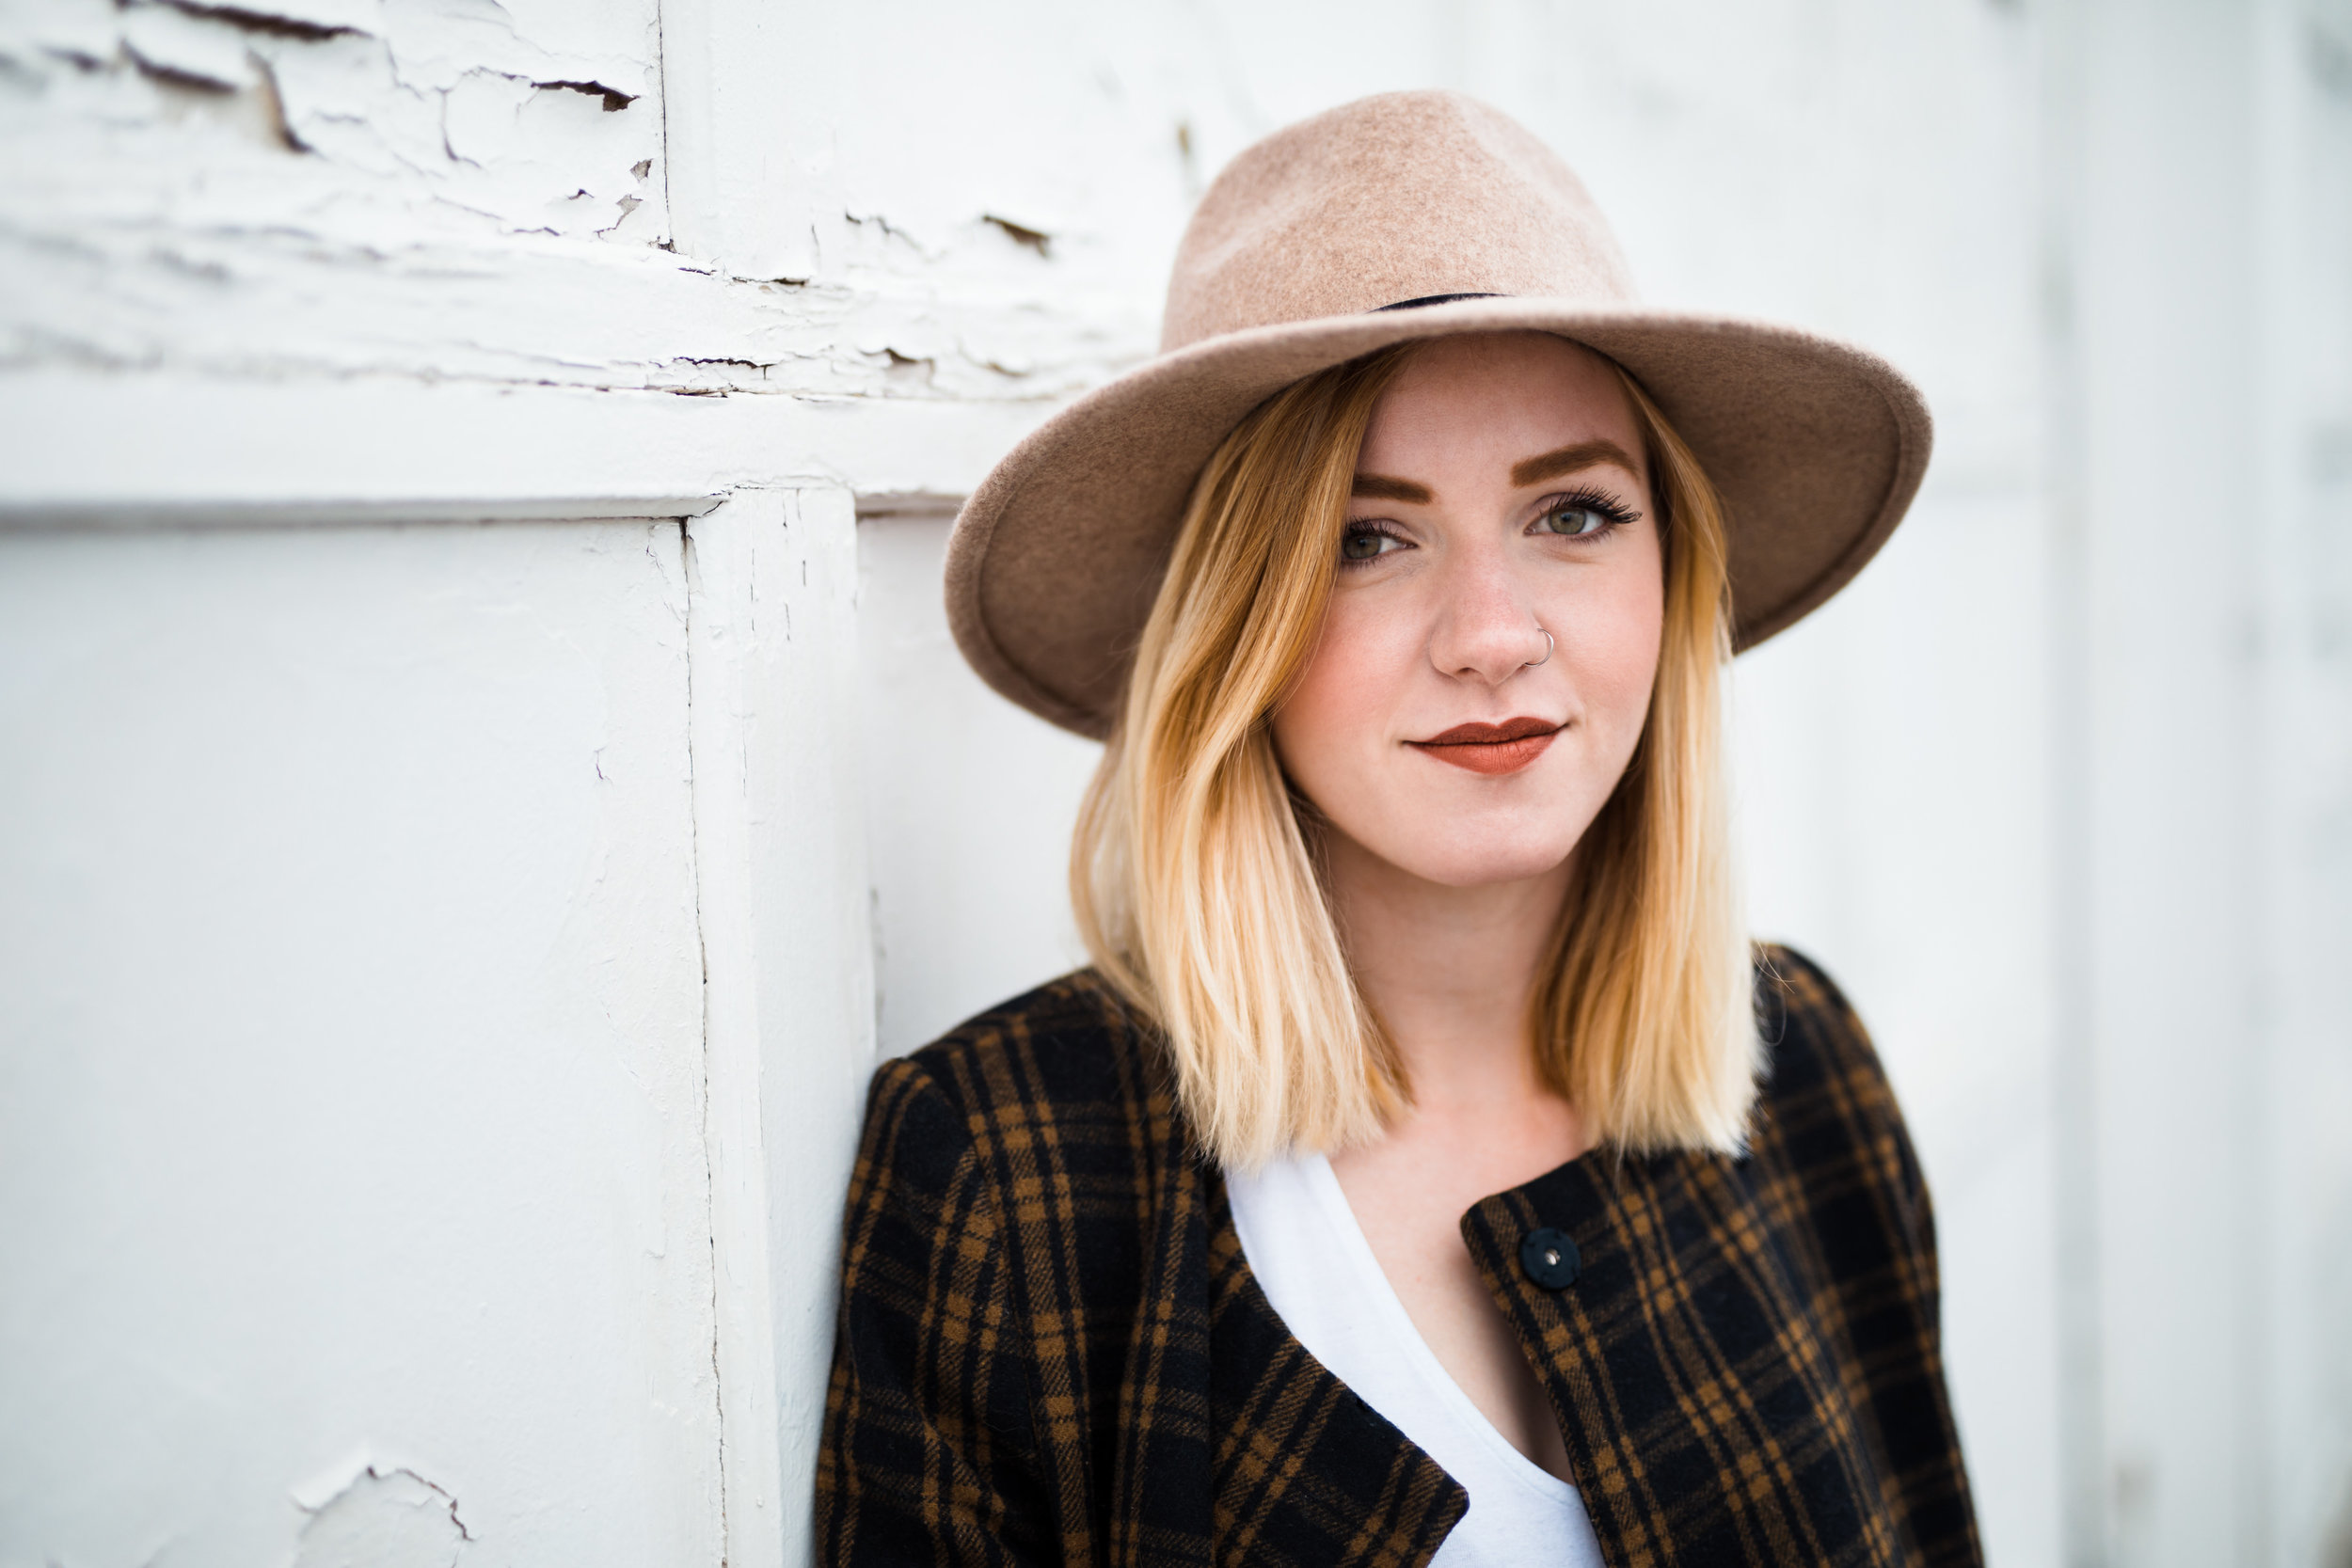 4-22-2017 Aimee Tomlinson Portraits - 1.jpg